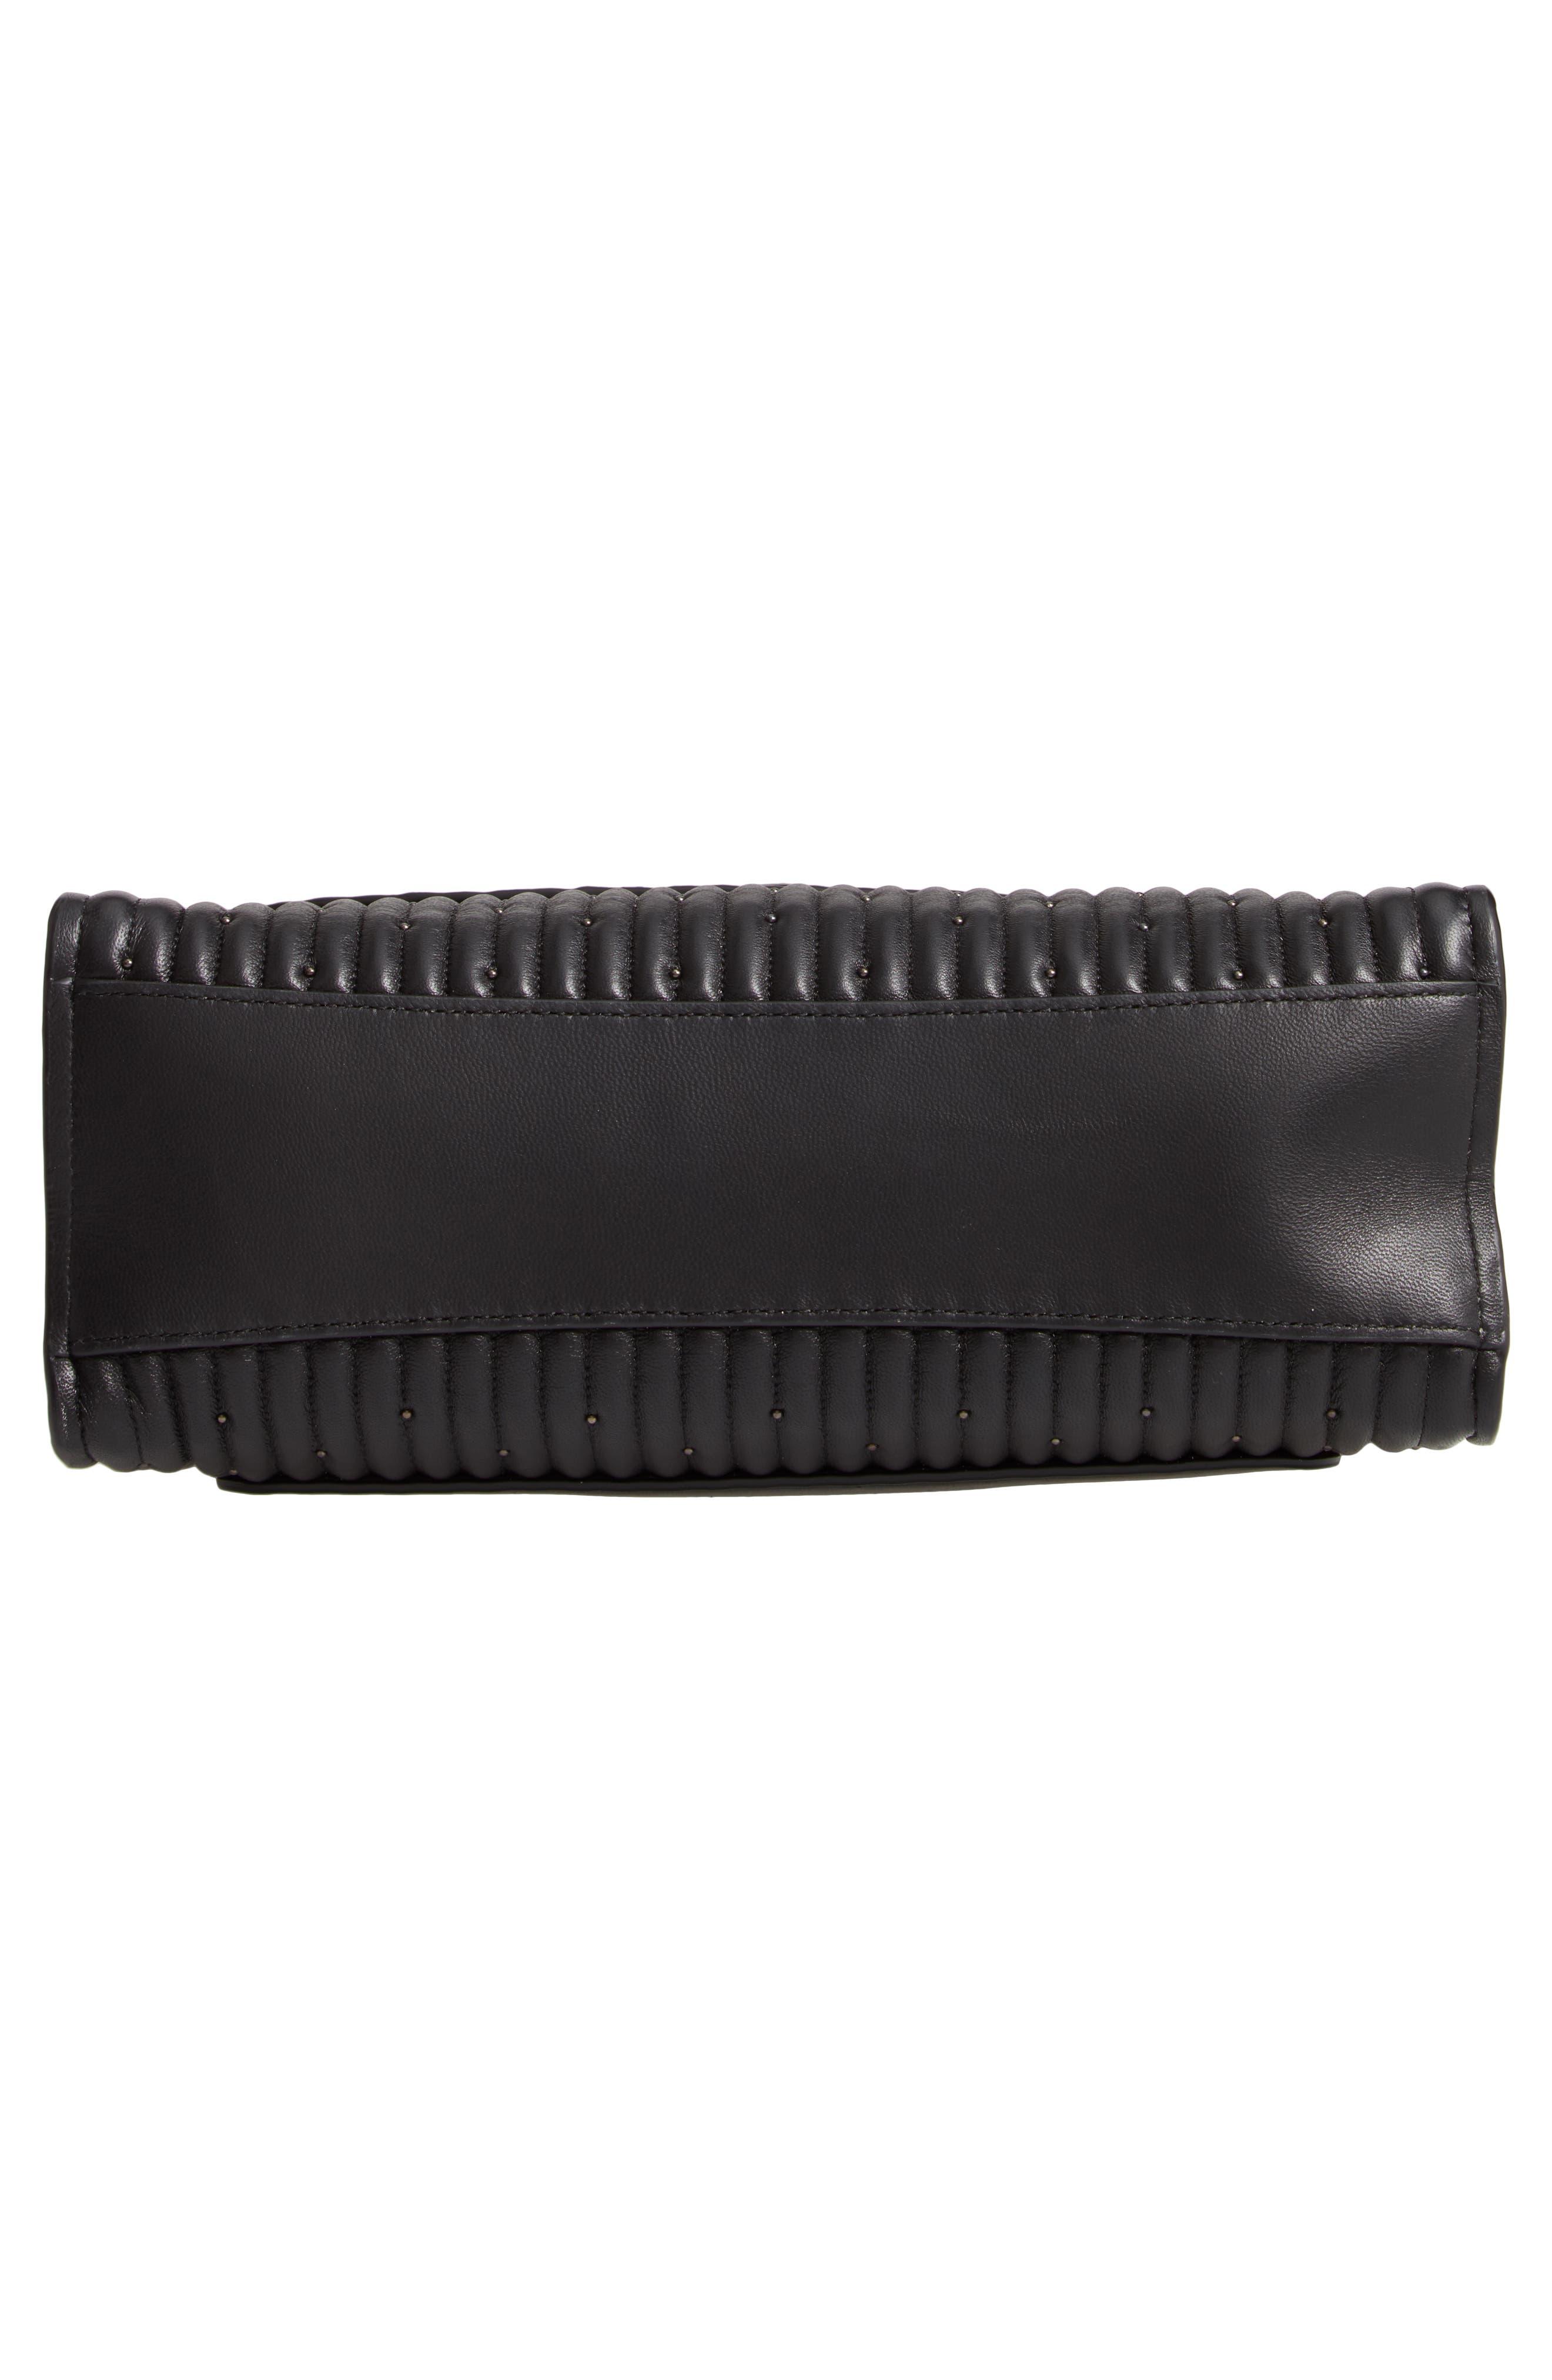 COACH, Parker Quilted Leather Shoulder Bag, Alternate thumbnail 7, color, BLACK